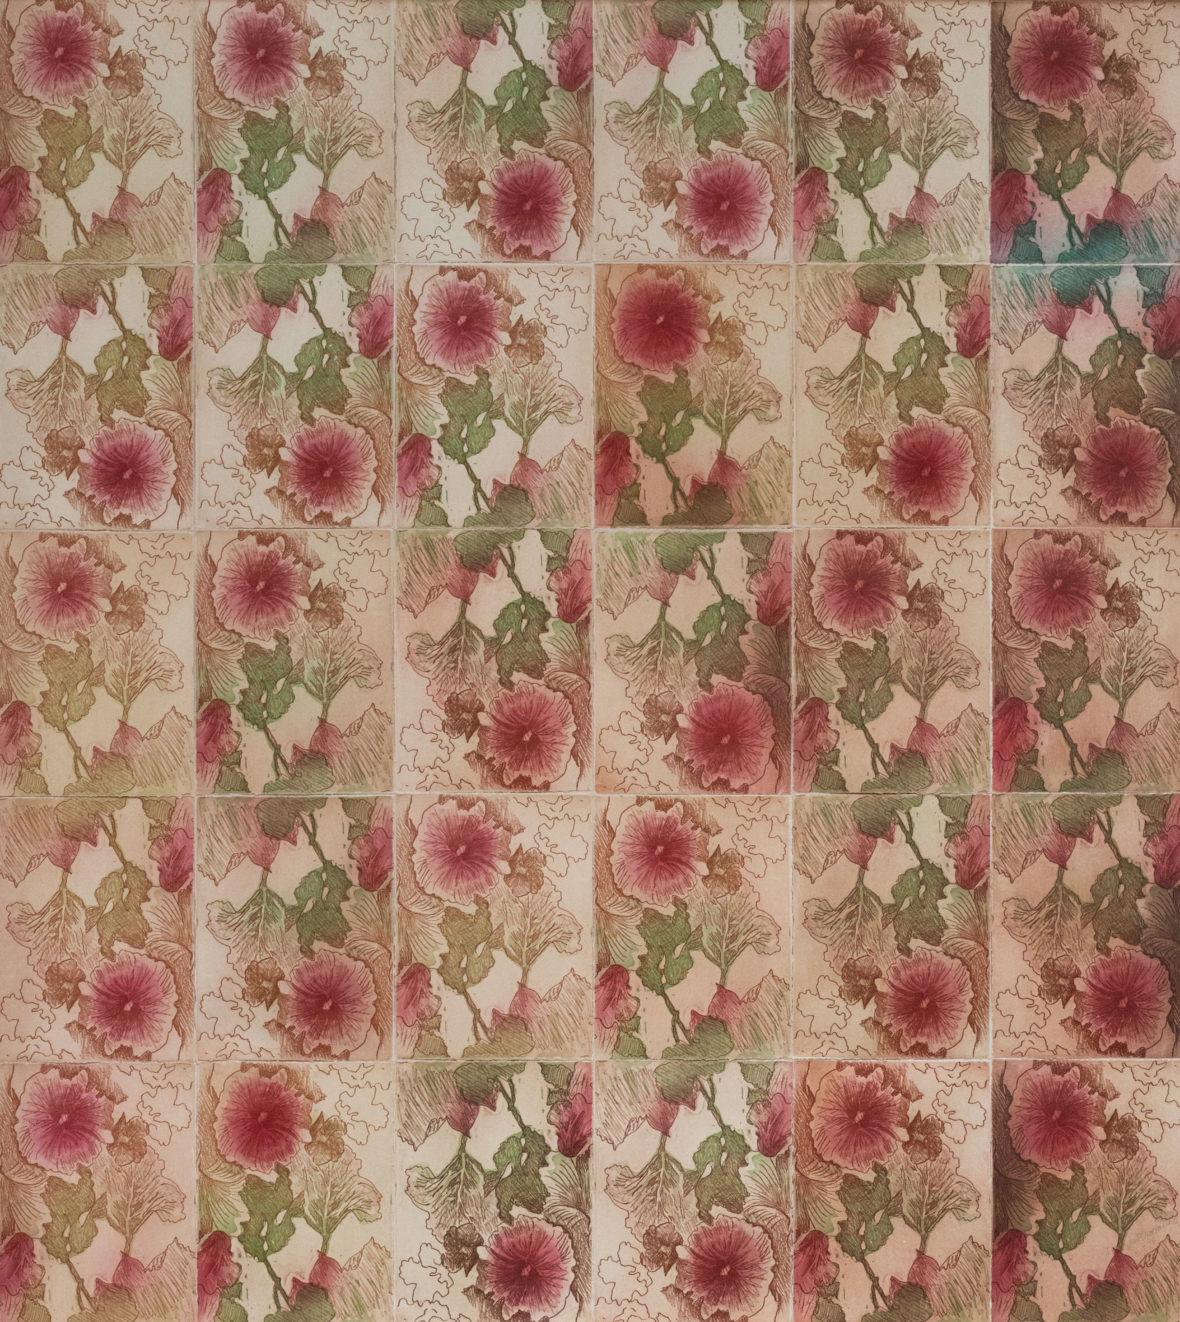 Sarjasta Tapettikukkia / From the series Wallpaper Flowers